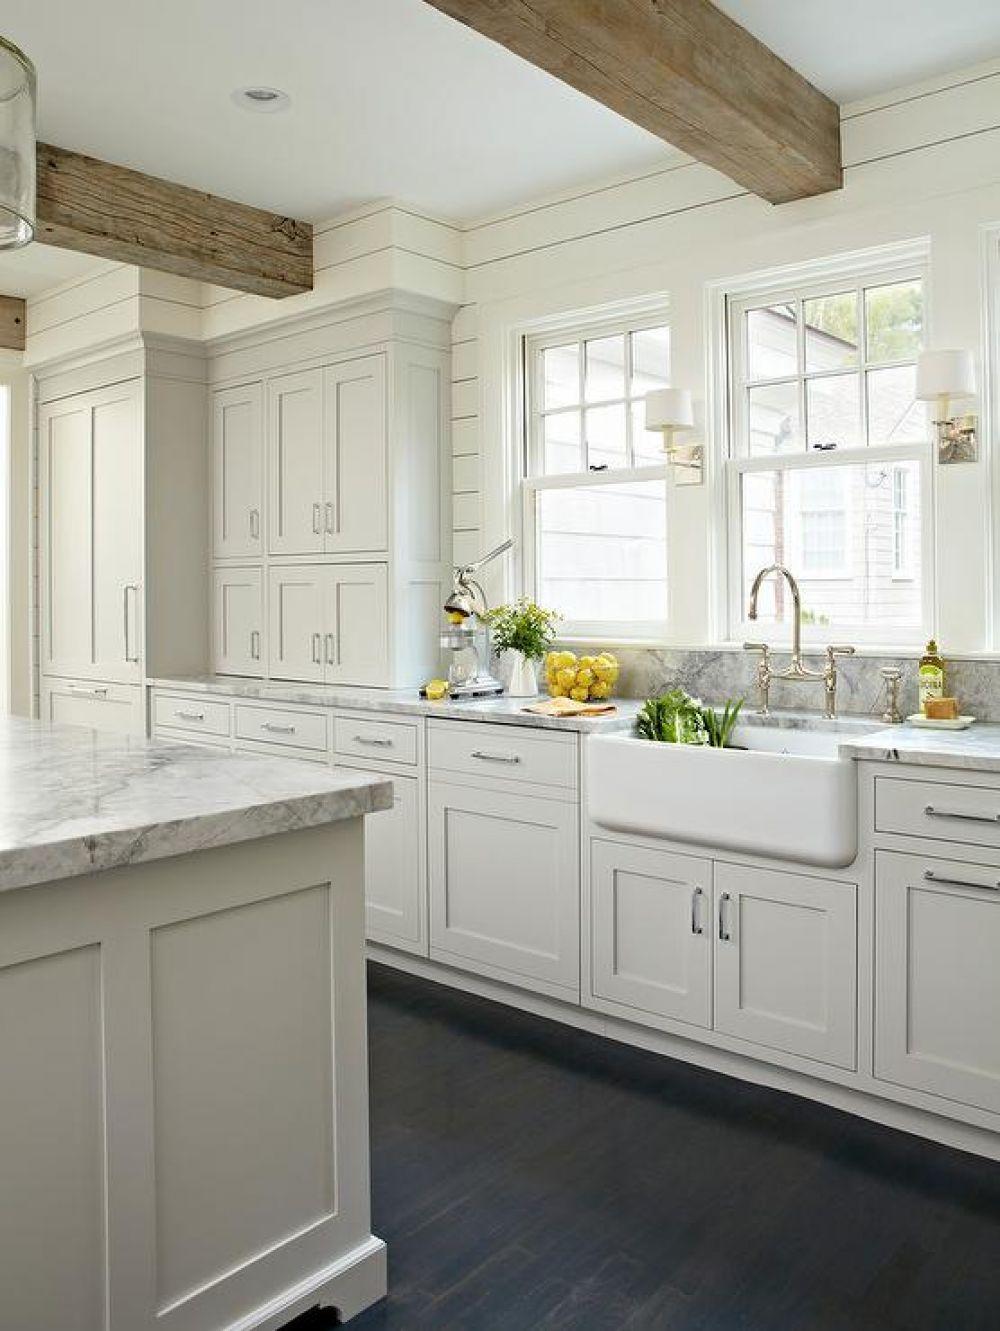 22 Tulsa Remodel Reveal Modern White Farmhouse Ideas Kitchen Cabinet Design Rustic Kitchen Cabinets White Kitchen Design